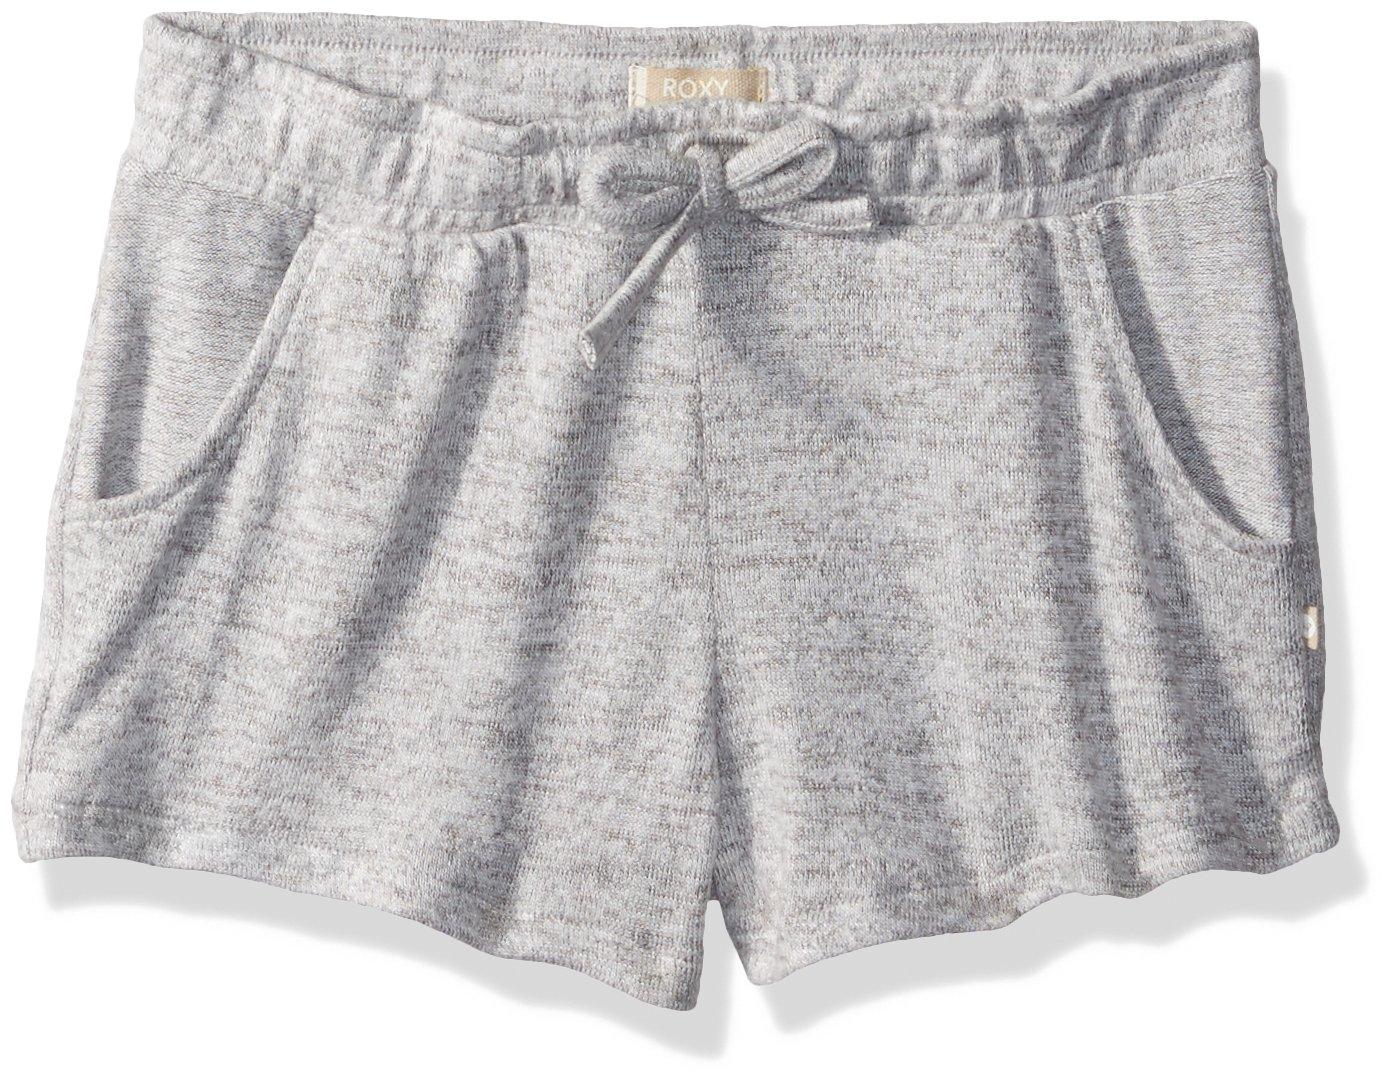 Roxy Big Girls' Summer Carnival Fleece Shorts, Heritage Heather, 14/XL